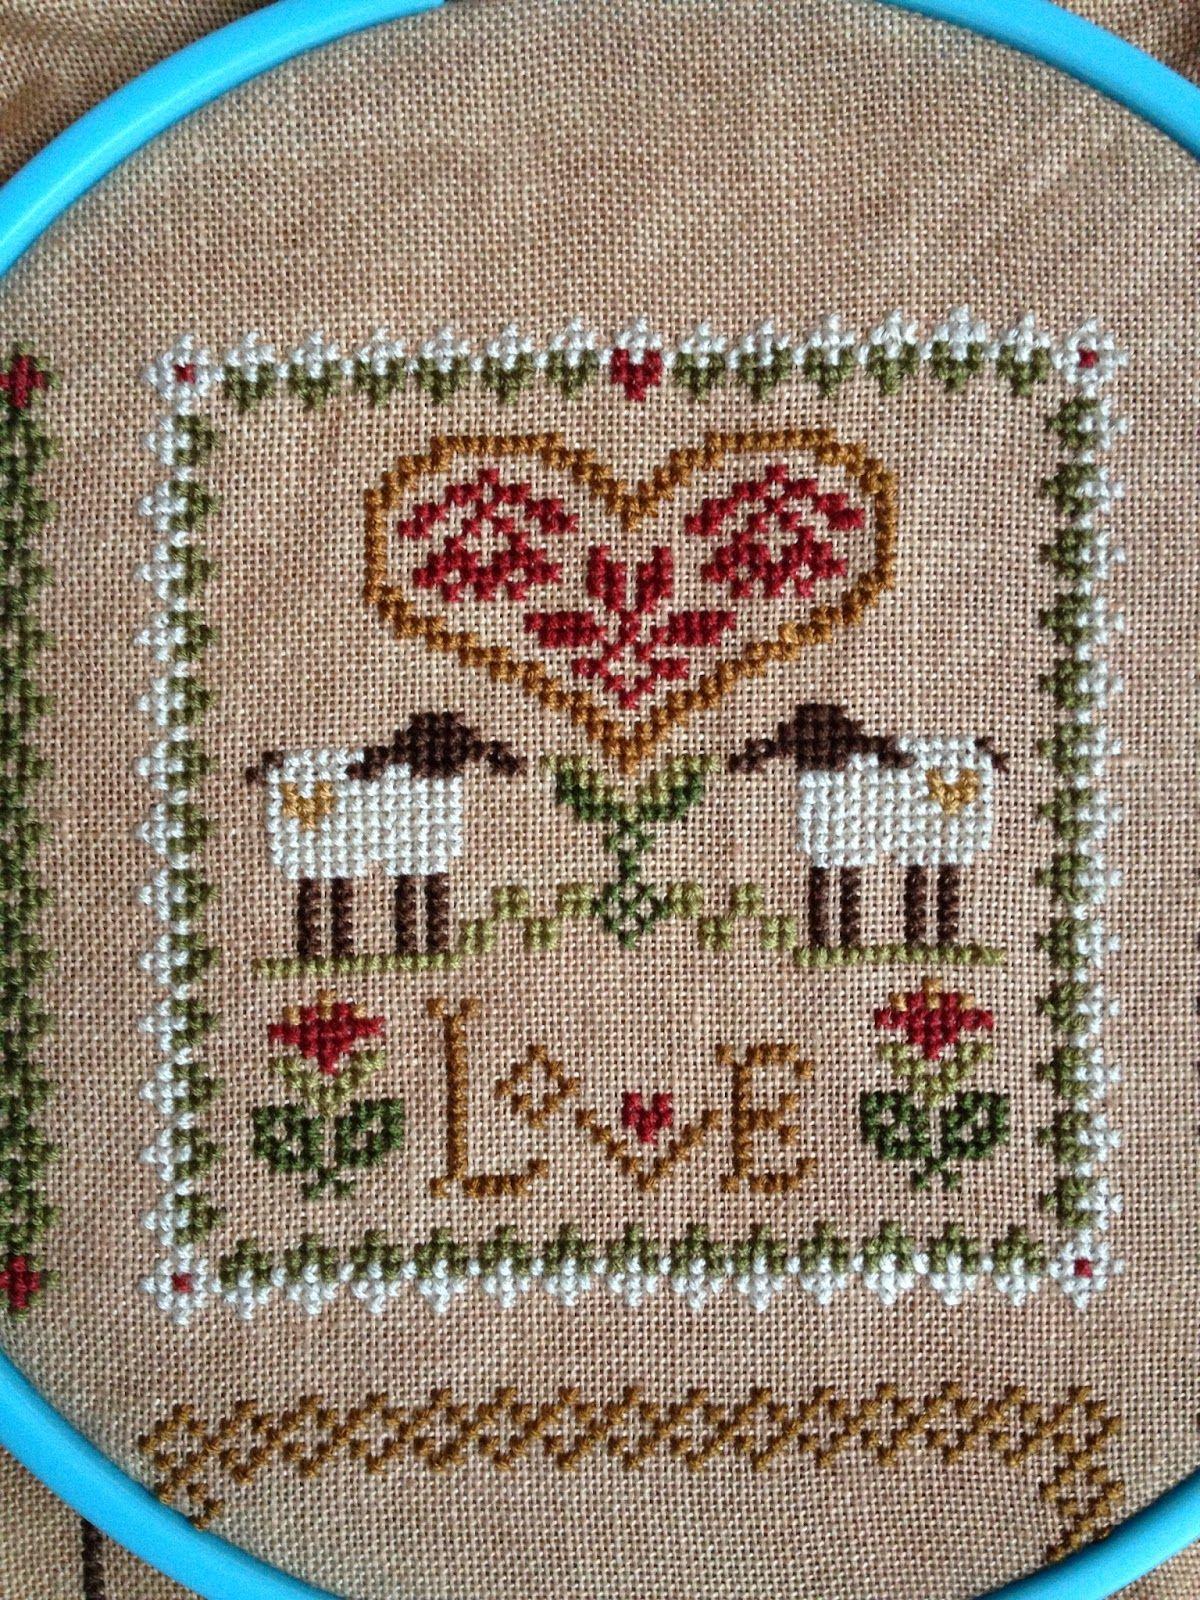 Little Sheep Virtues Cross Stitch - Love